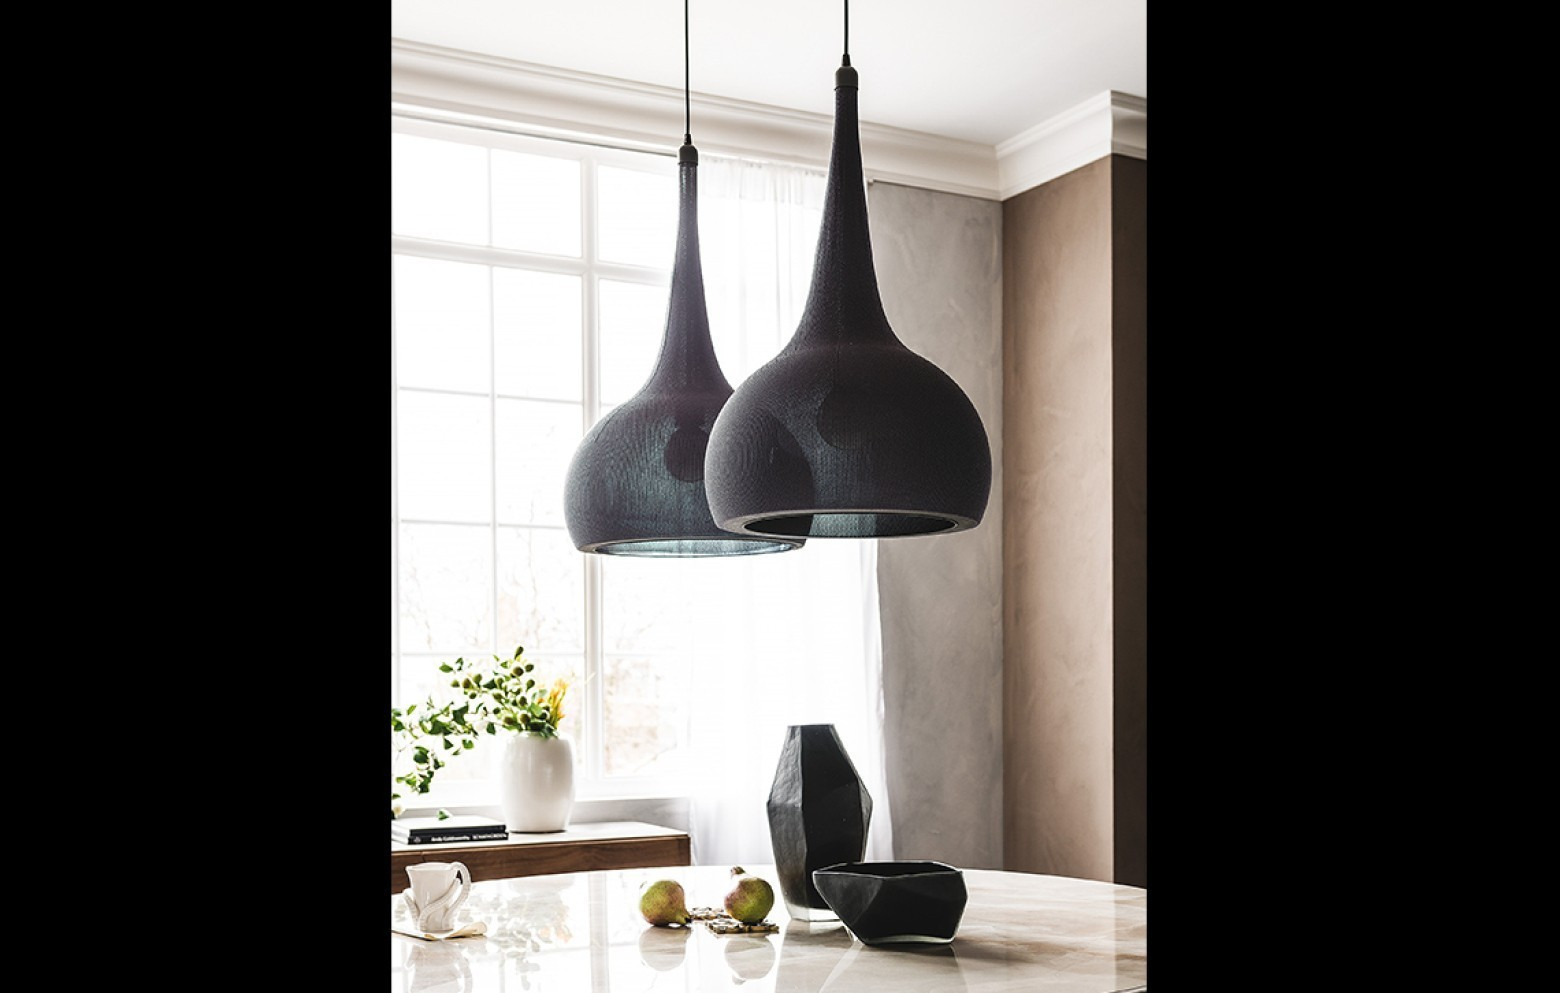 byblos h ngeleuchte lampen kleinm bel accessoires who 39 s perfect. Black Bedroom Furniture Sets. Home Design Ideas